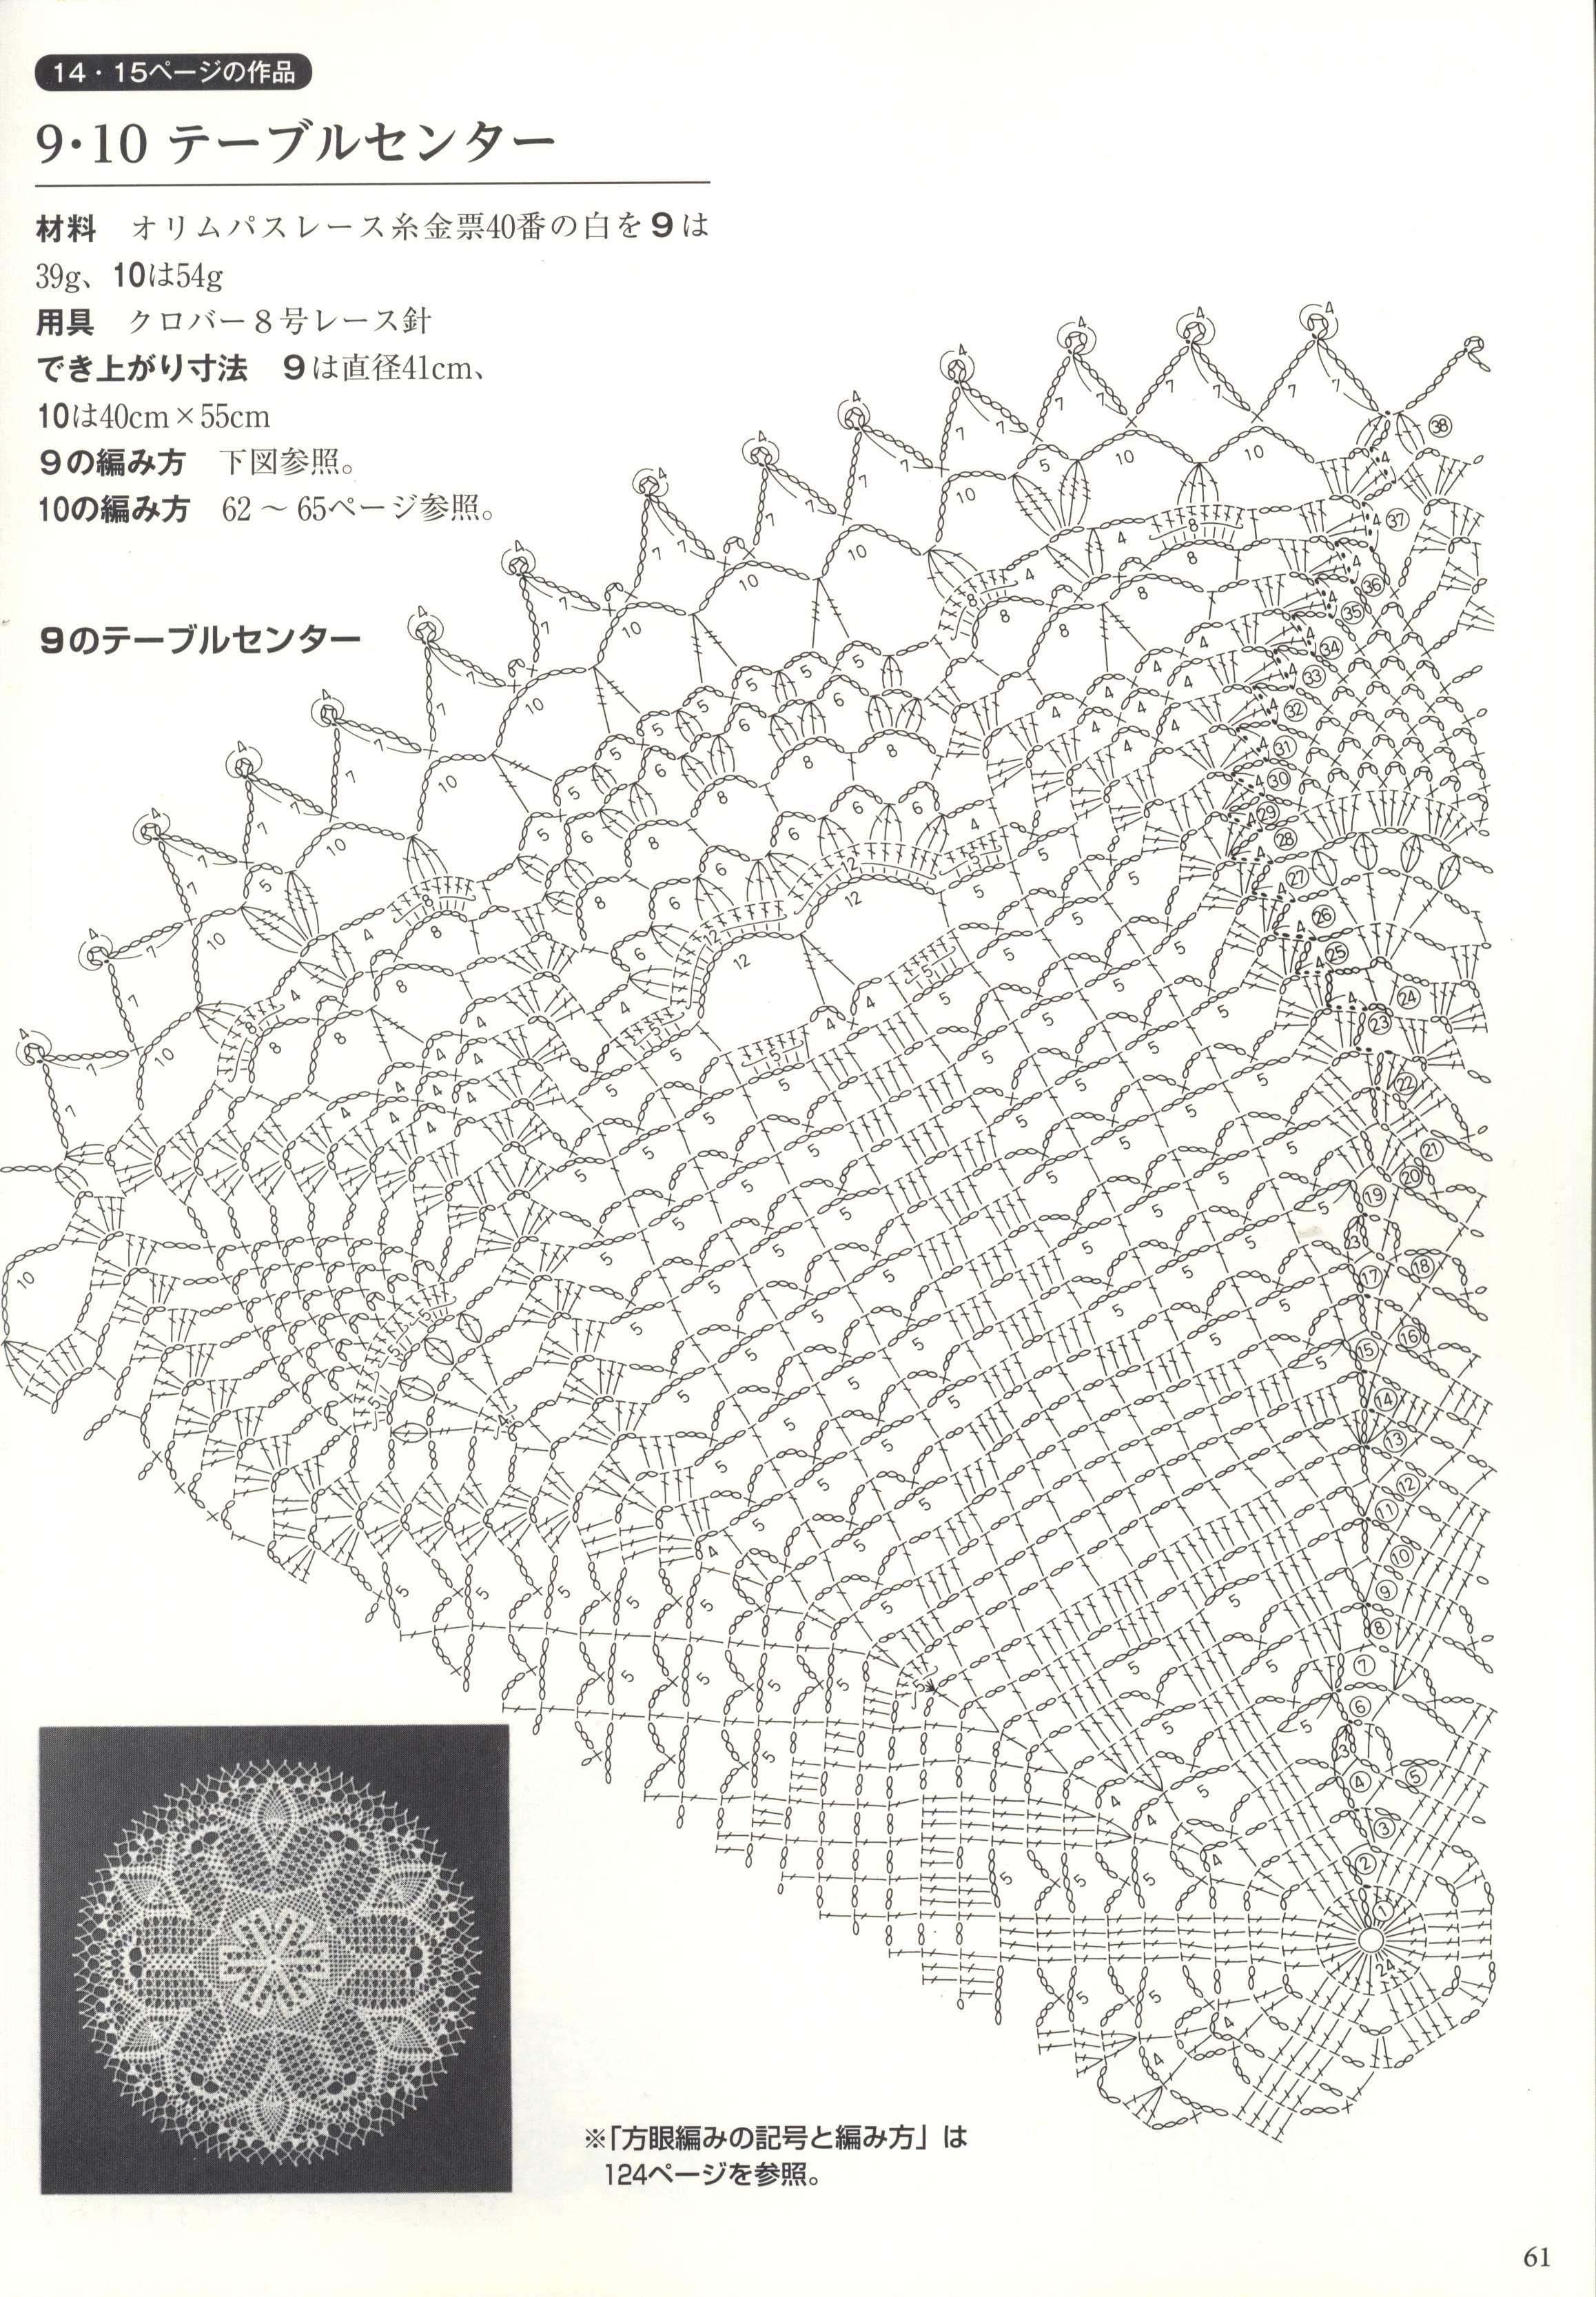 Pin By Josiane On Crochet Napperons